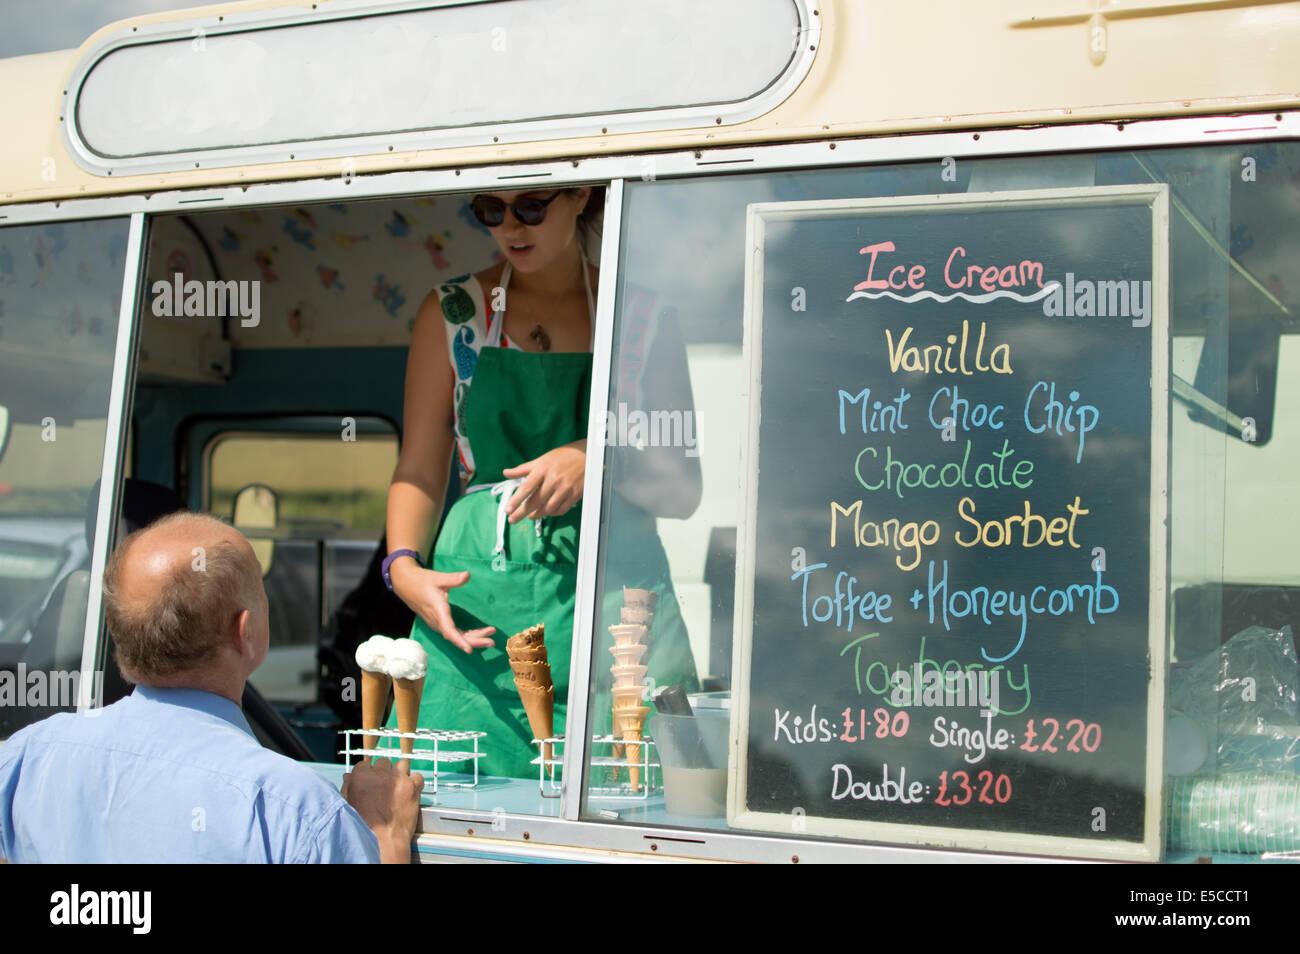 Vintage Ice Cream Van at Village Fair - Stock Image